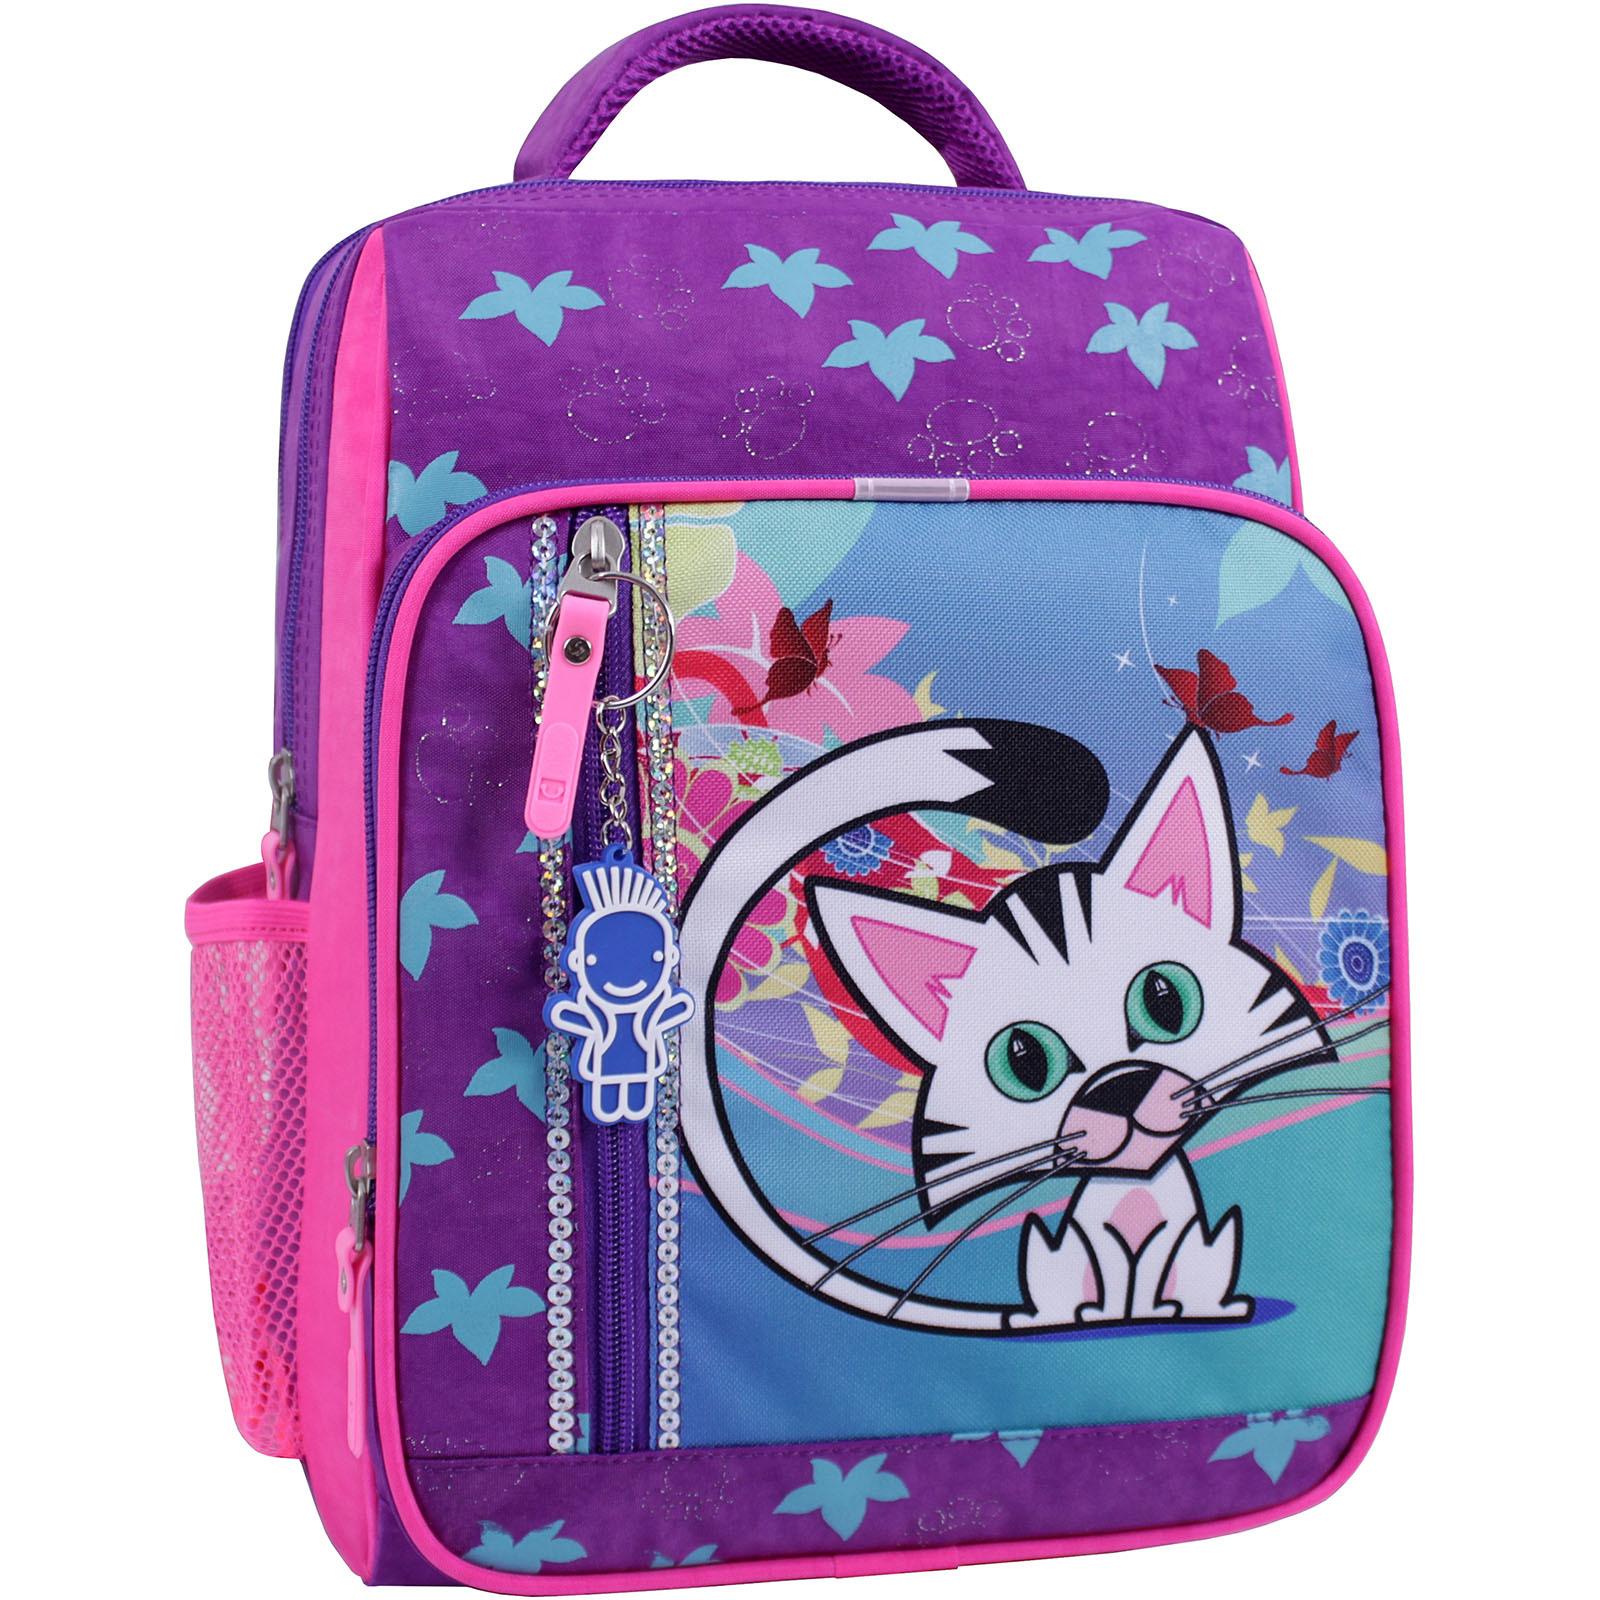 Школьные рюкзаки Рюкзак школьный Bagland Школьник 8 л. фиолетовый 502 (0012870) IMG_1091_суб.502_.JPG